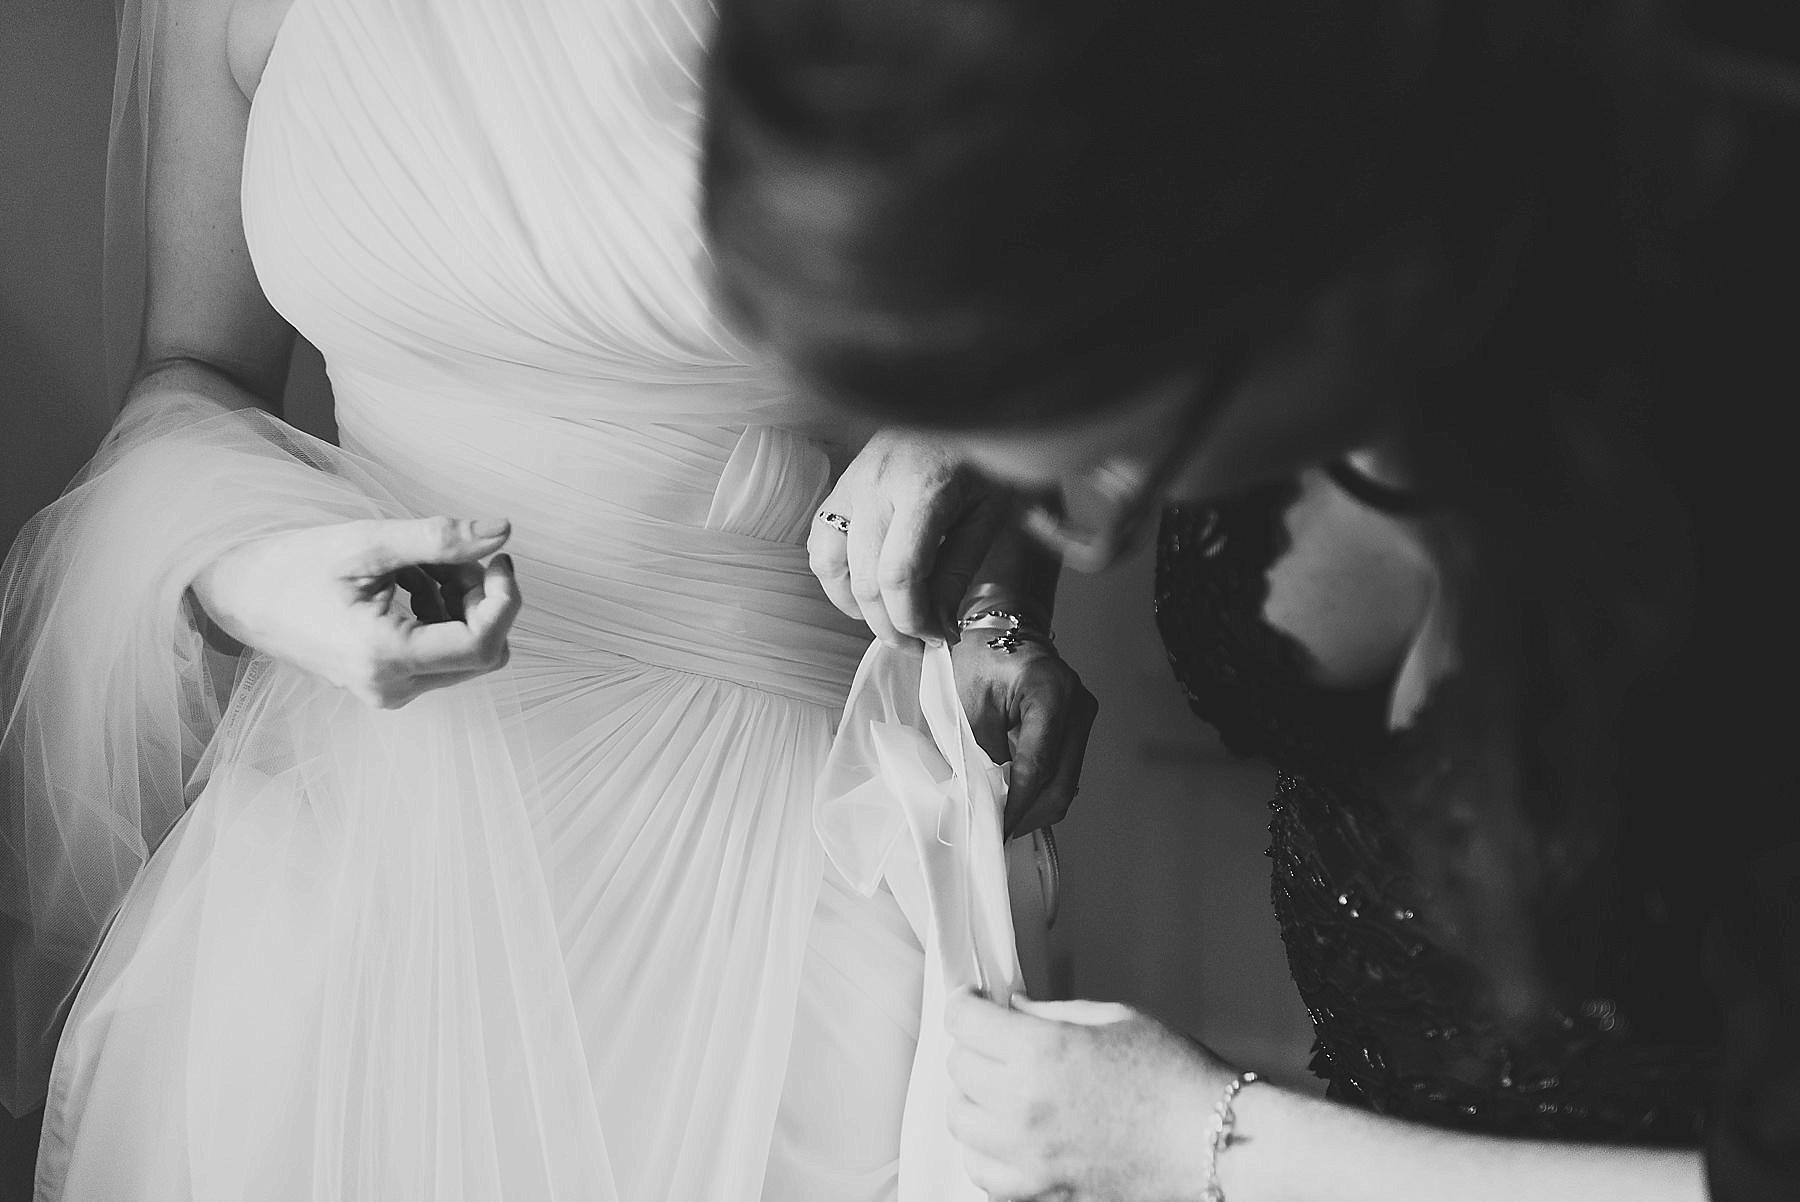 bridesmaid fixing the wedding dress